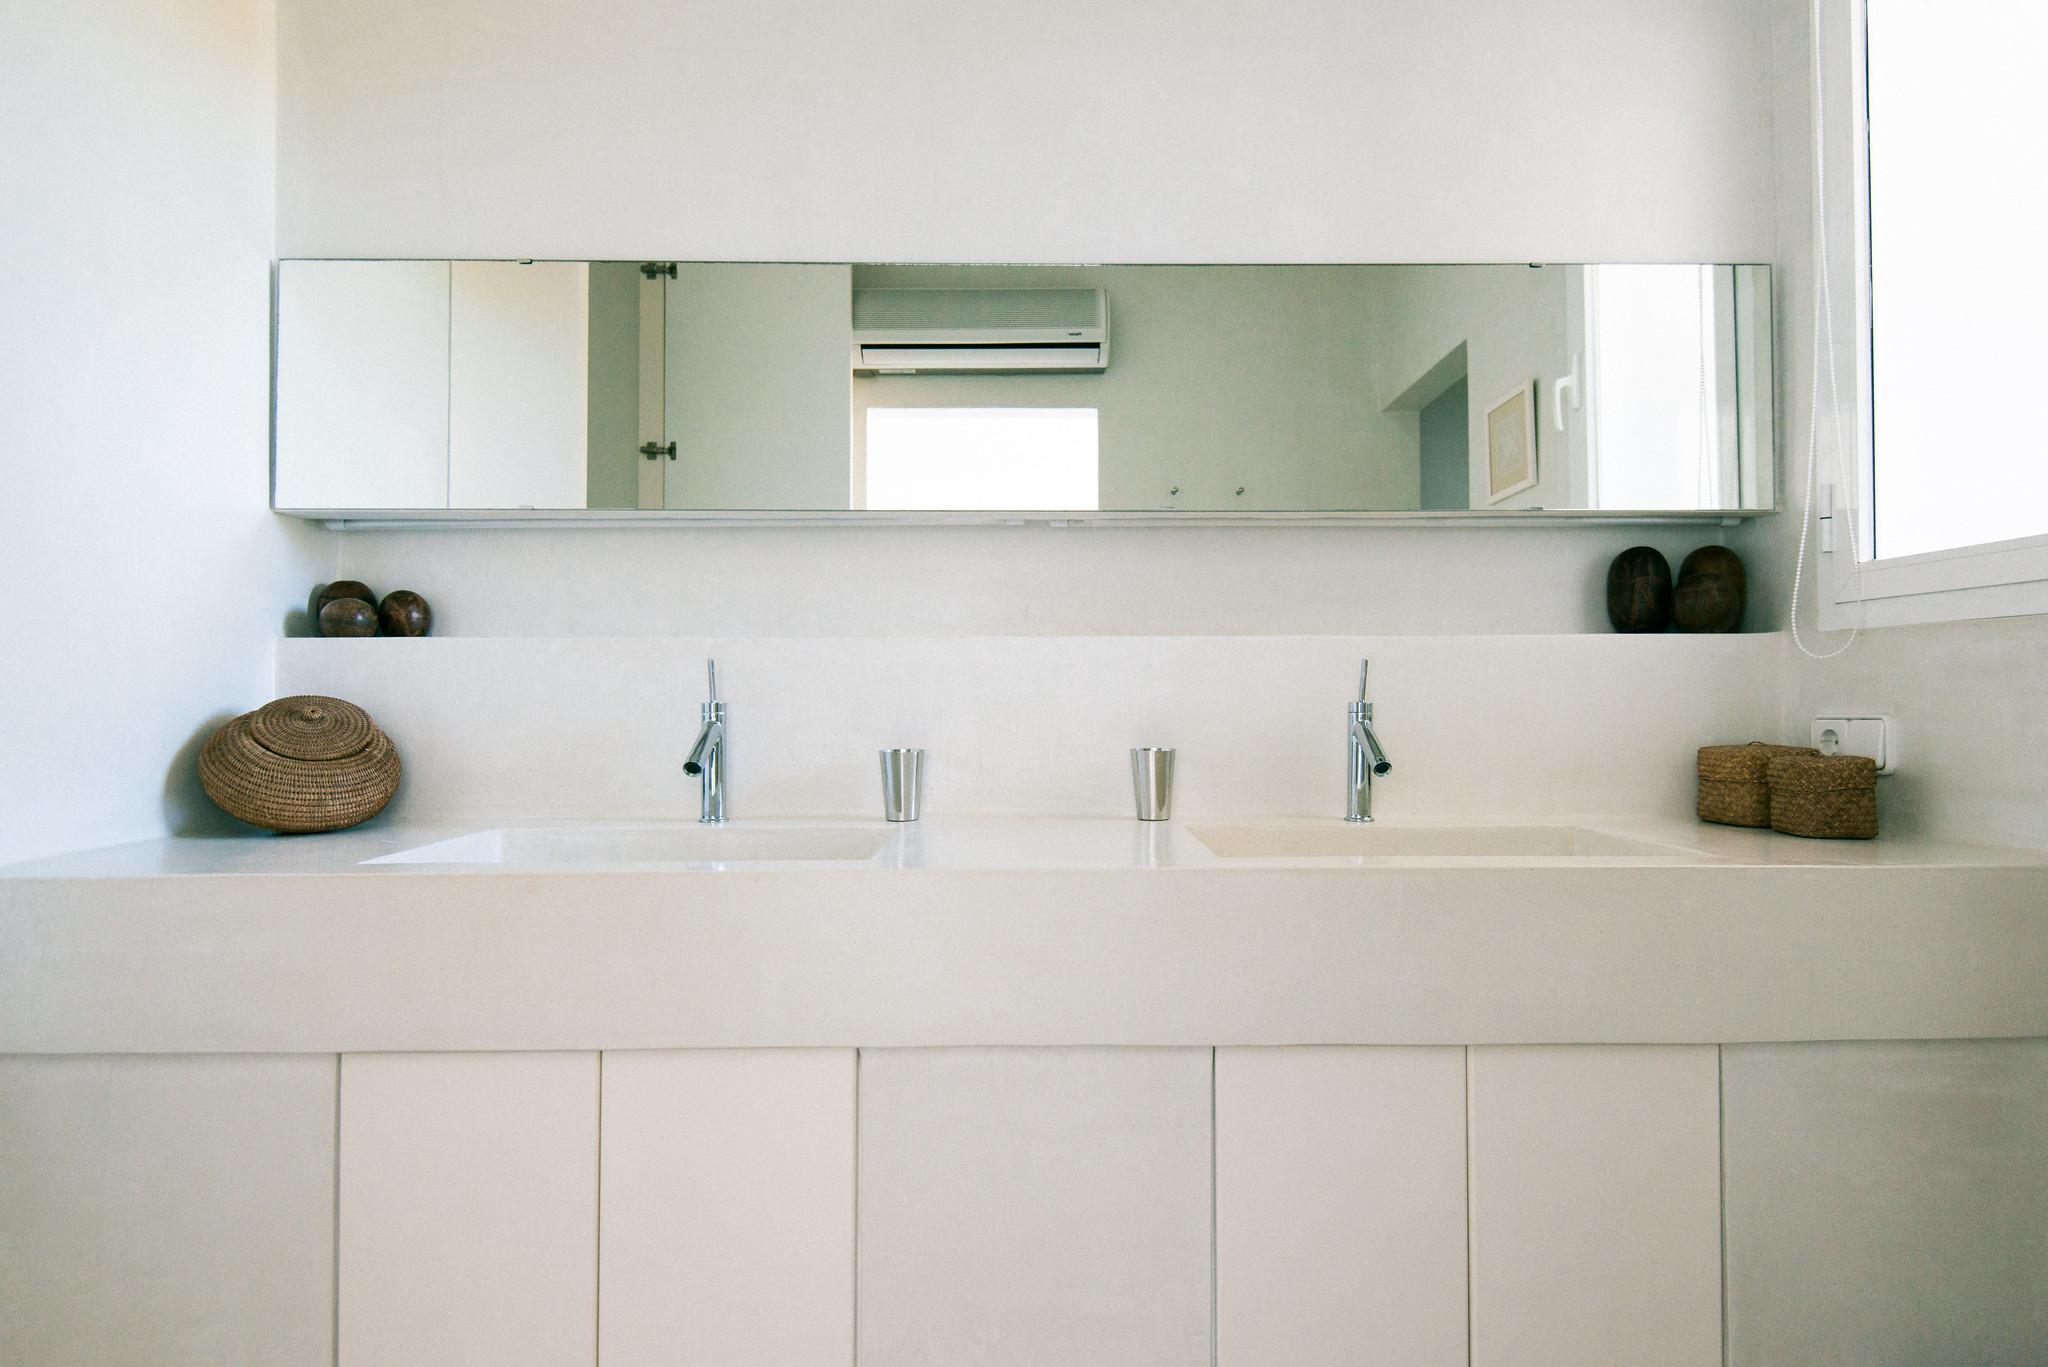 https://www.white-ibiza.com/wp-content/uploads/2020/06/white-ibiza-villas-casa-odette-interior-bathroom4.jpg